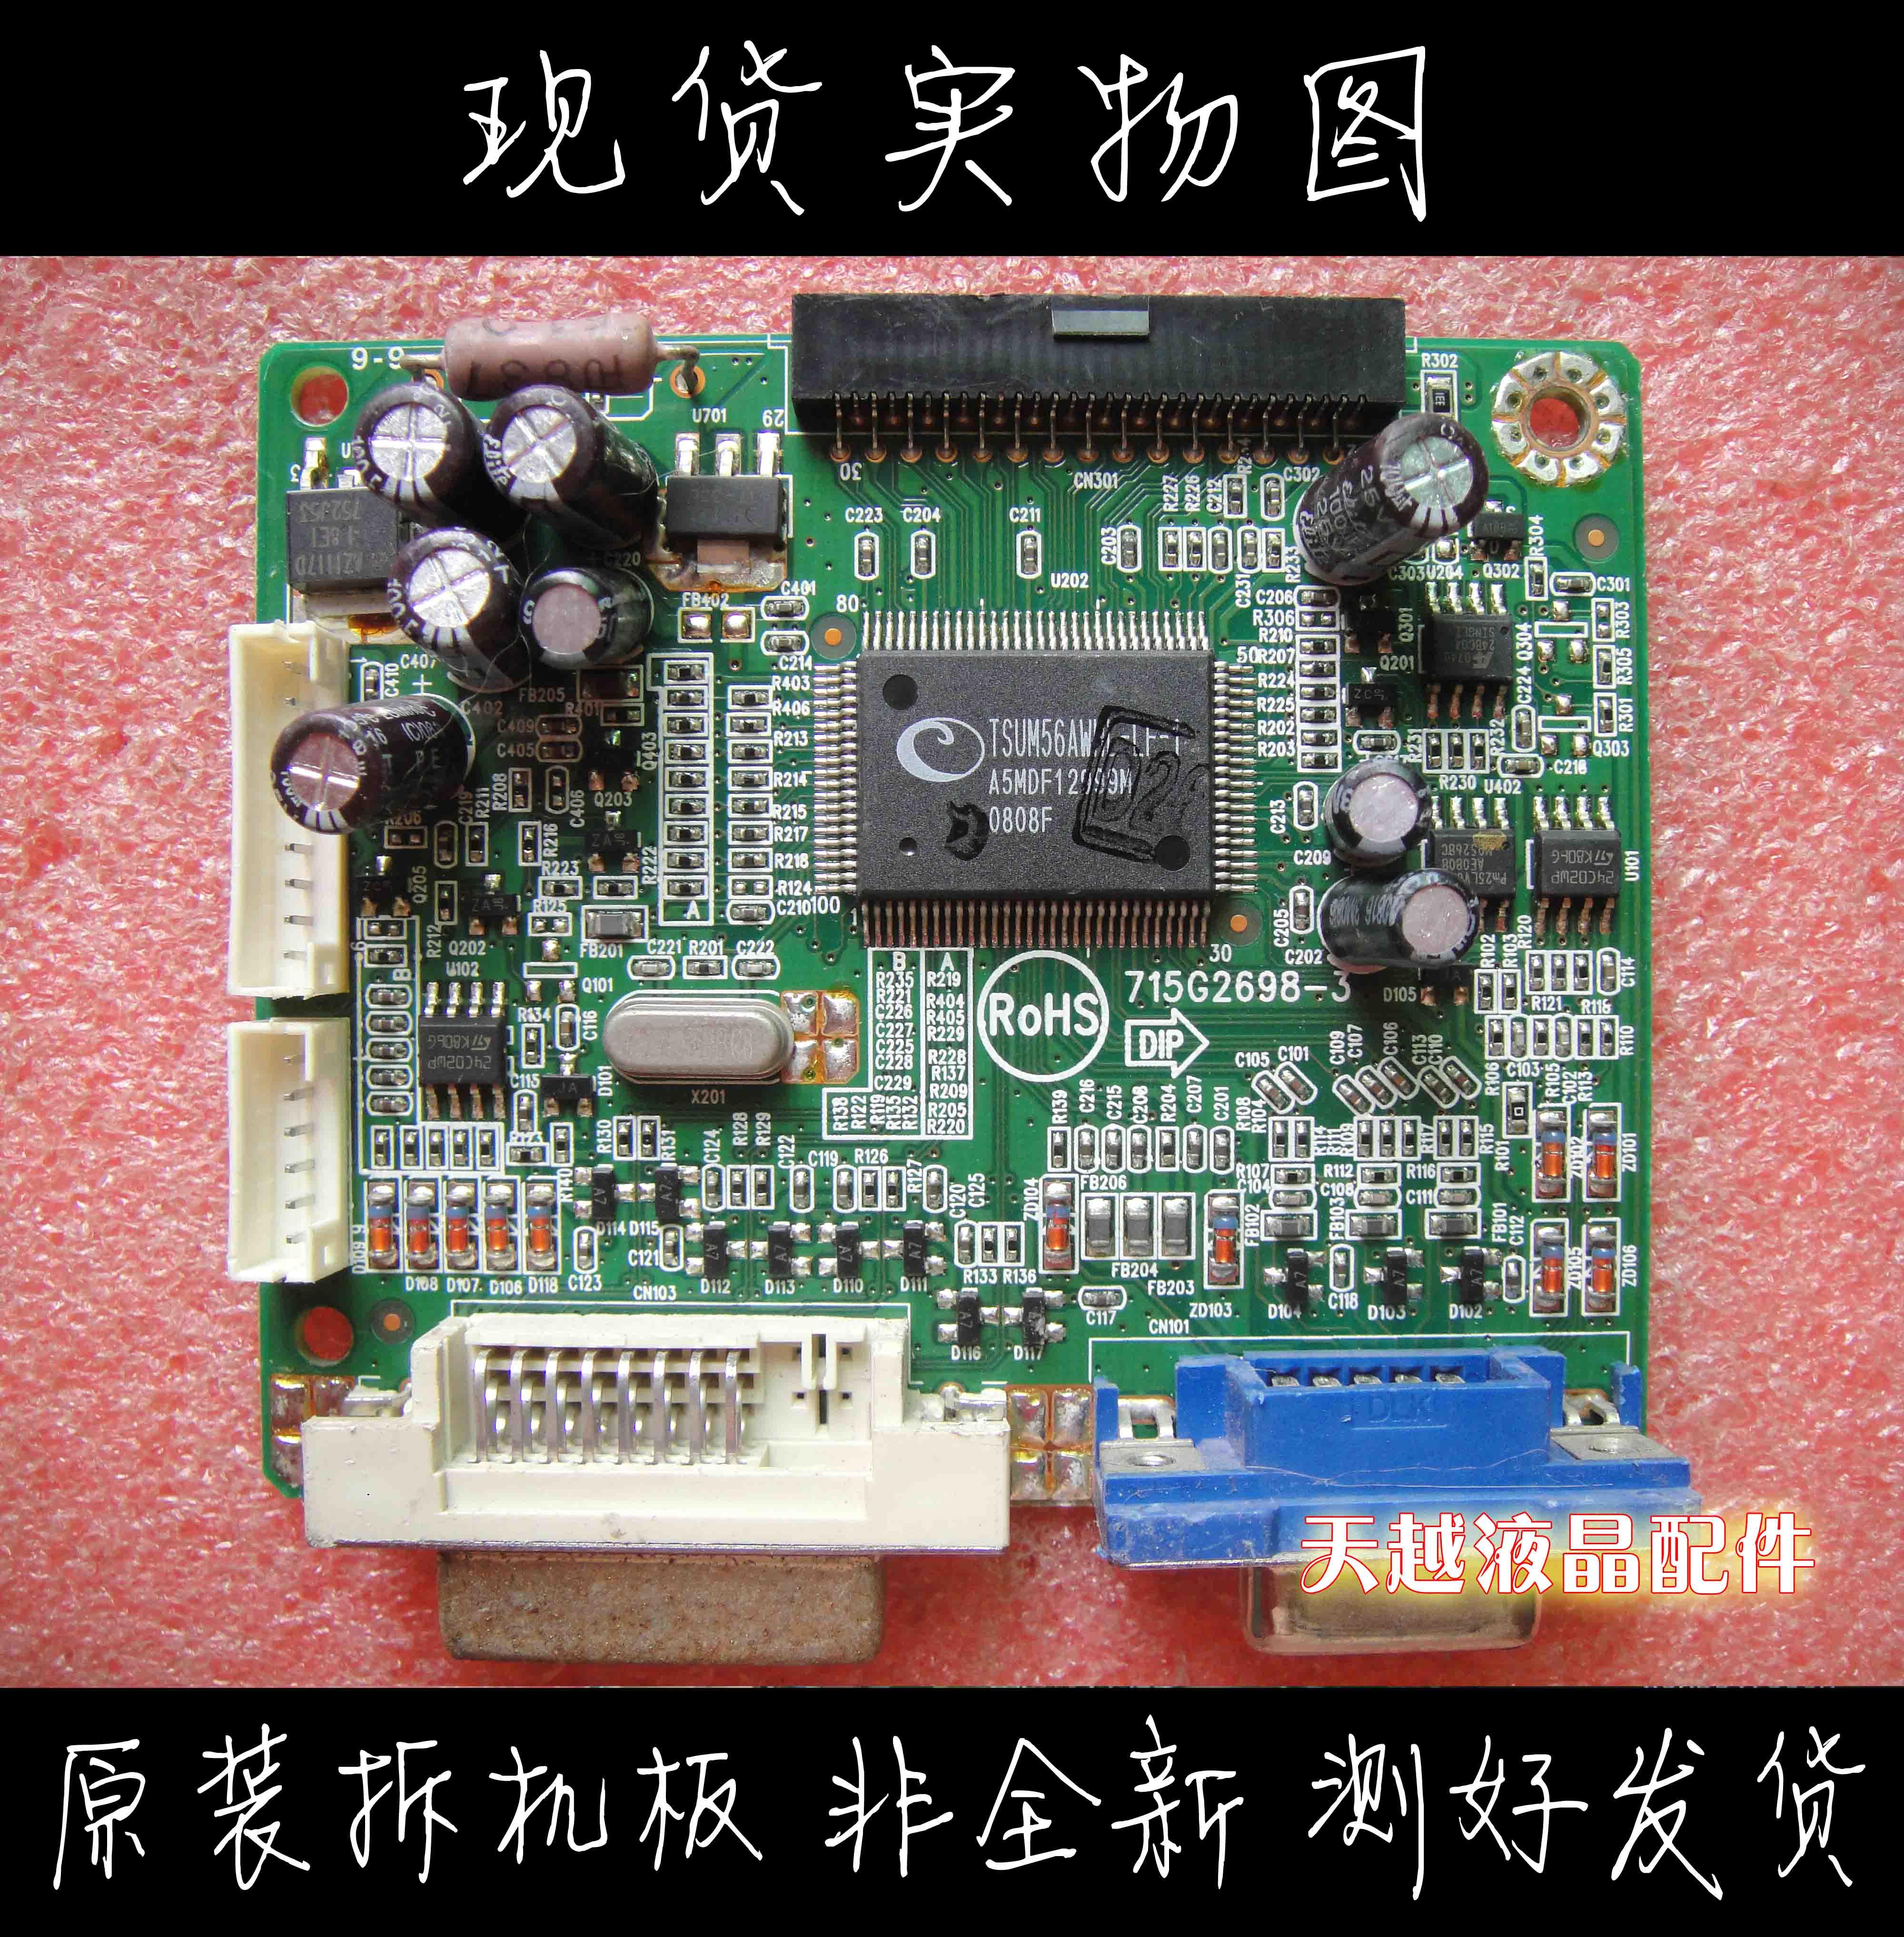 Tablero de controlador Guanjie 917W AOC 917W placa base 715g2698-3